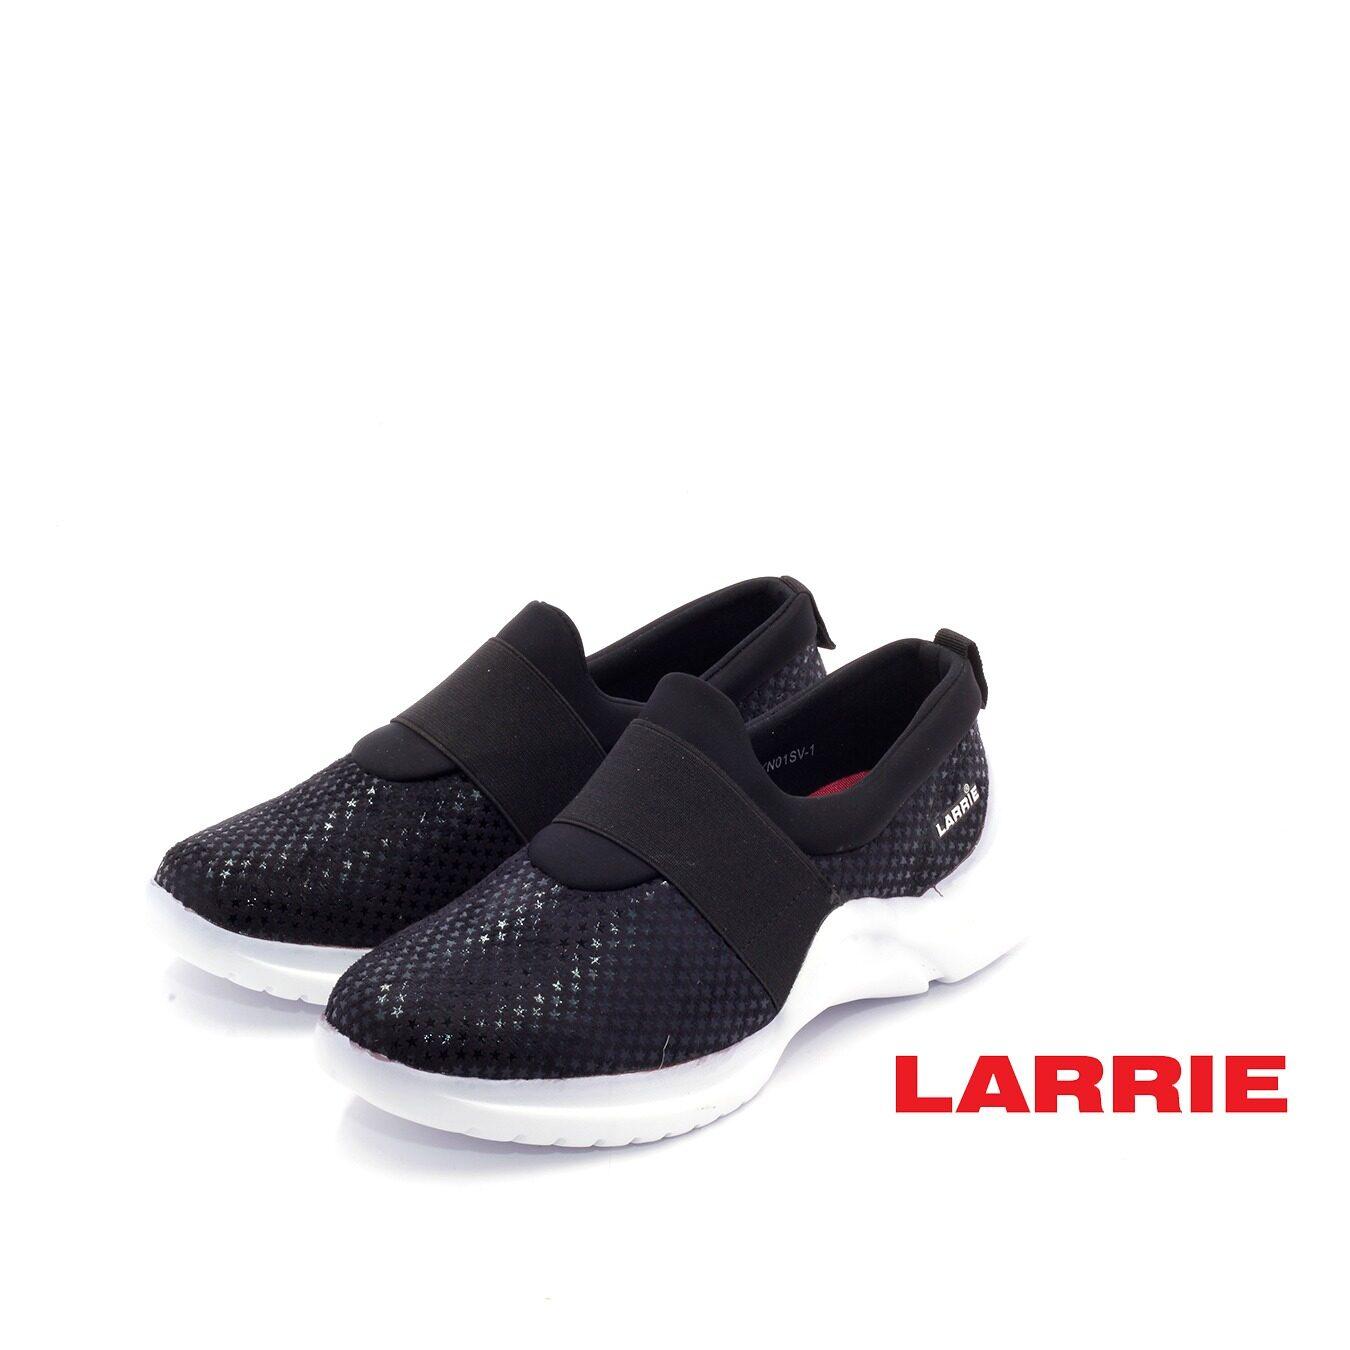 LARRIE Kasut Wanita Thick Band Casual Basic Sneaker Women  - L61902-KN01SV